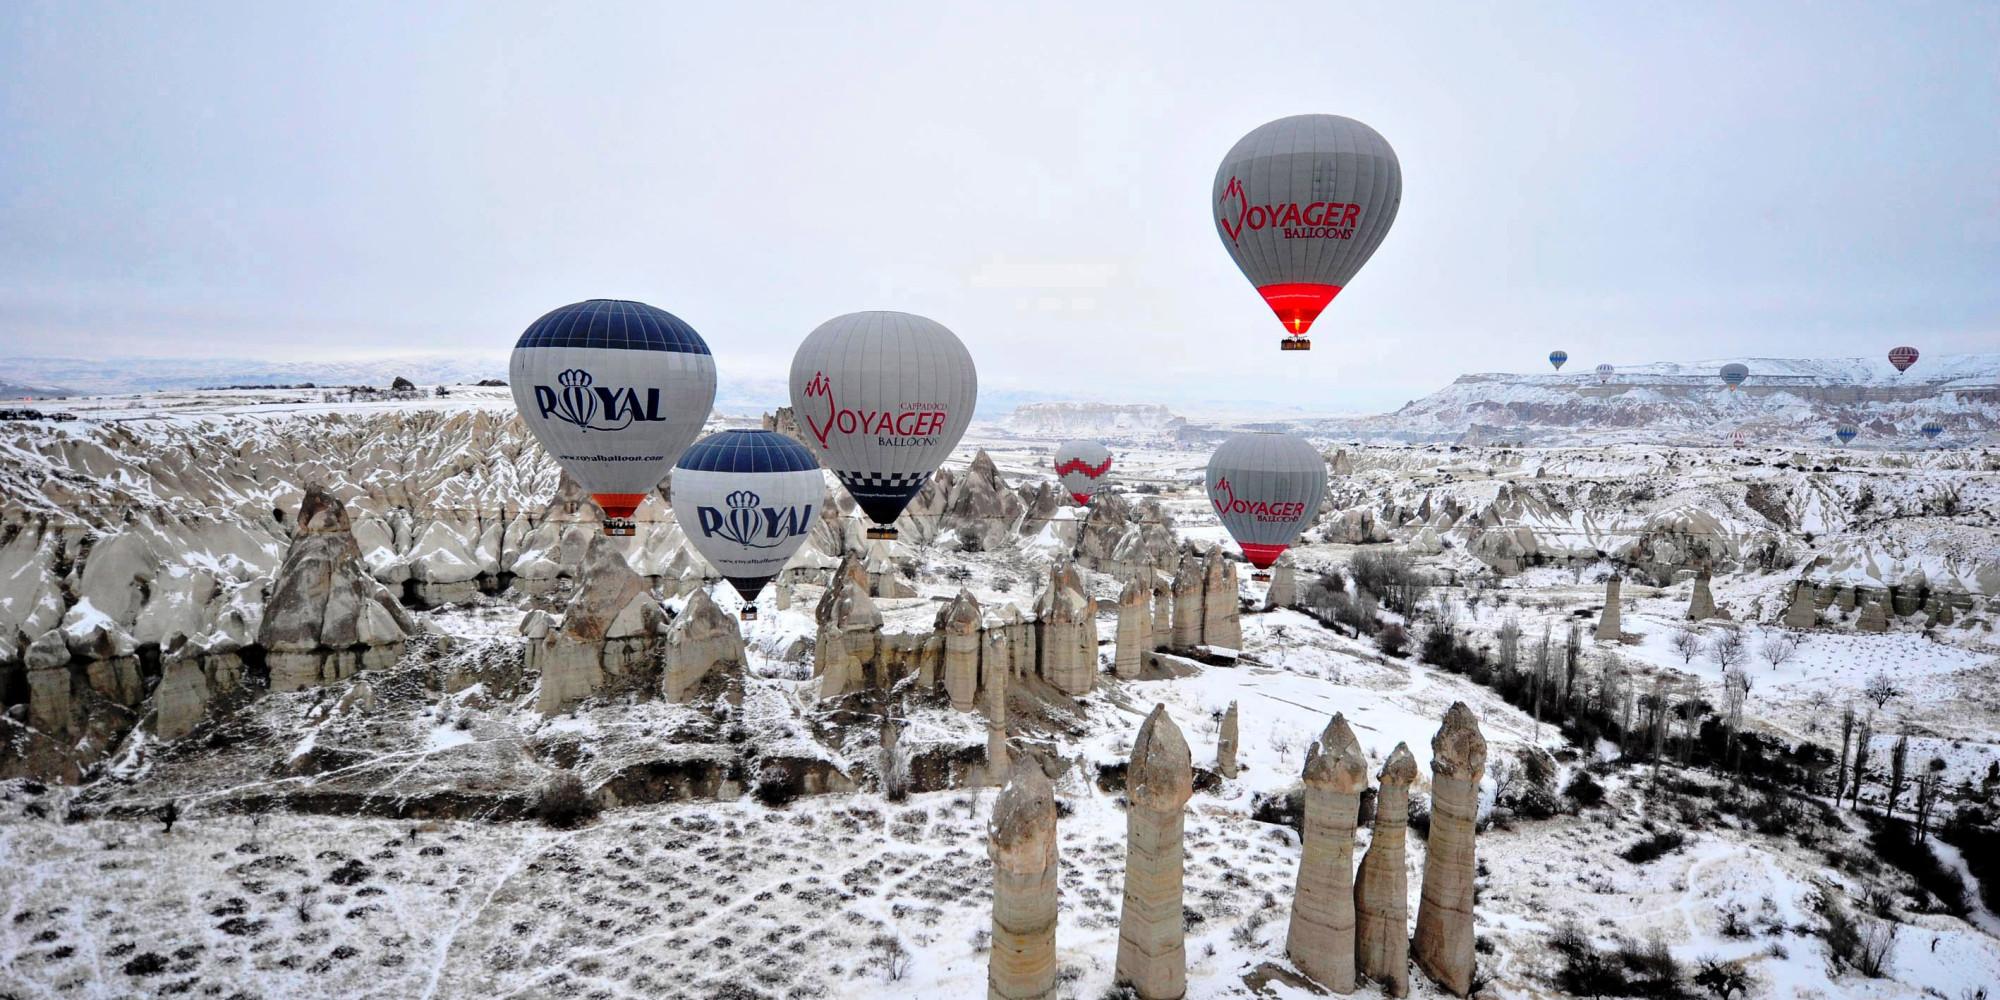 Hot Air Balloon In Cappadocia Turkey On This Travel Tuesday